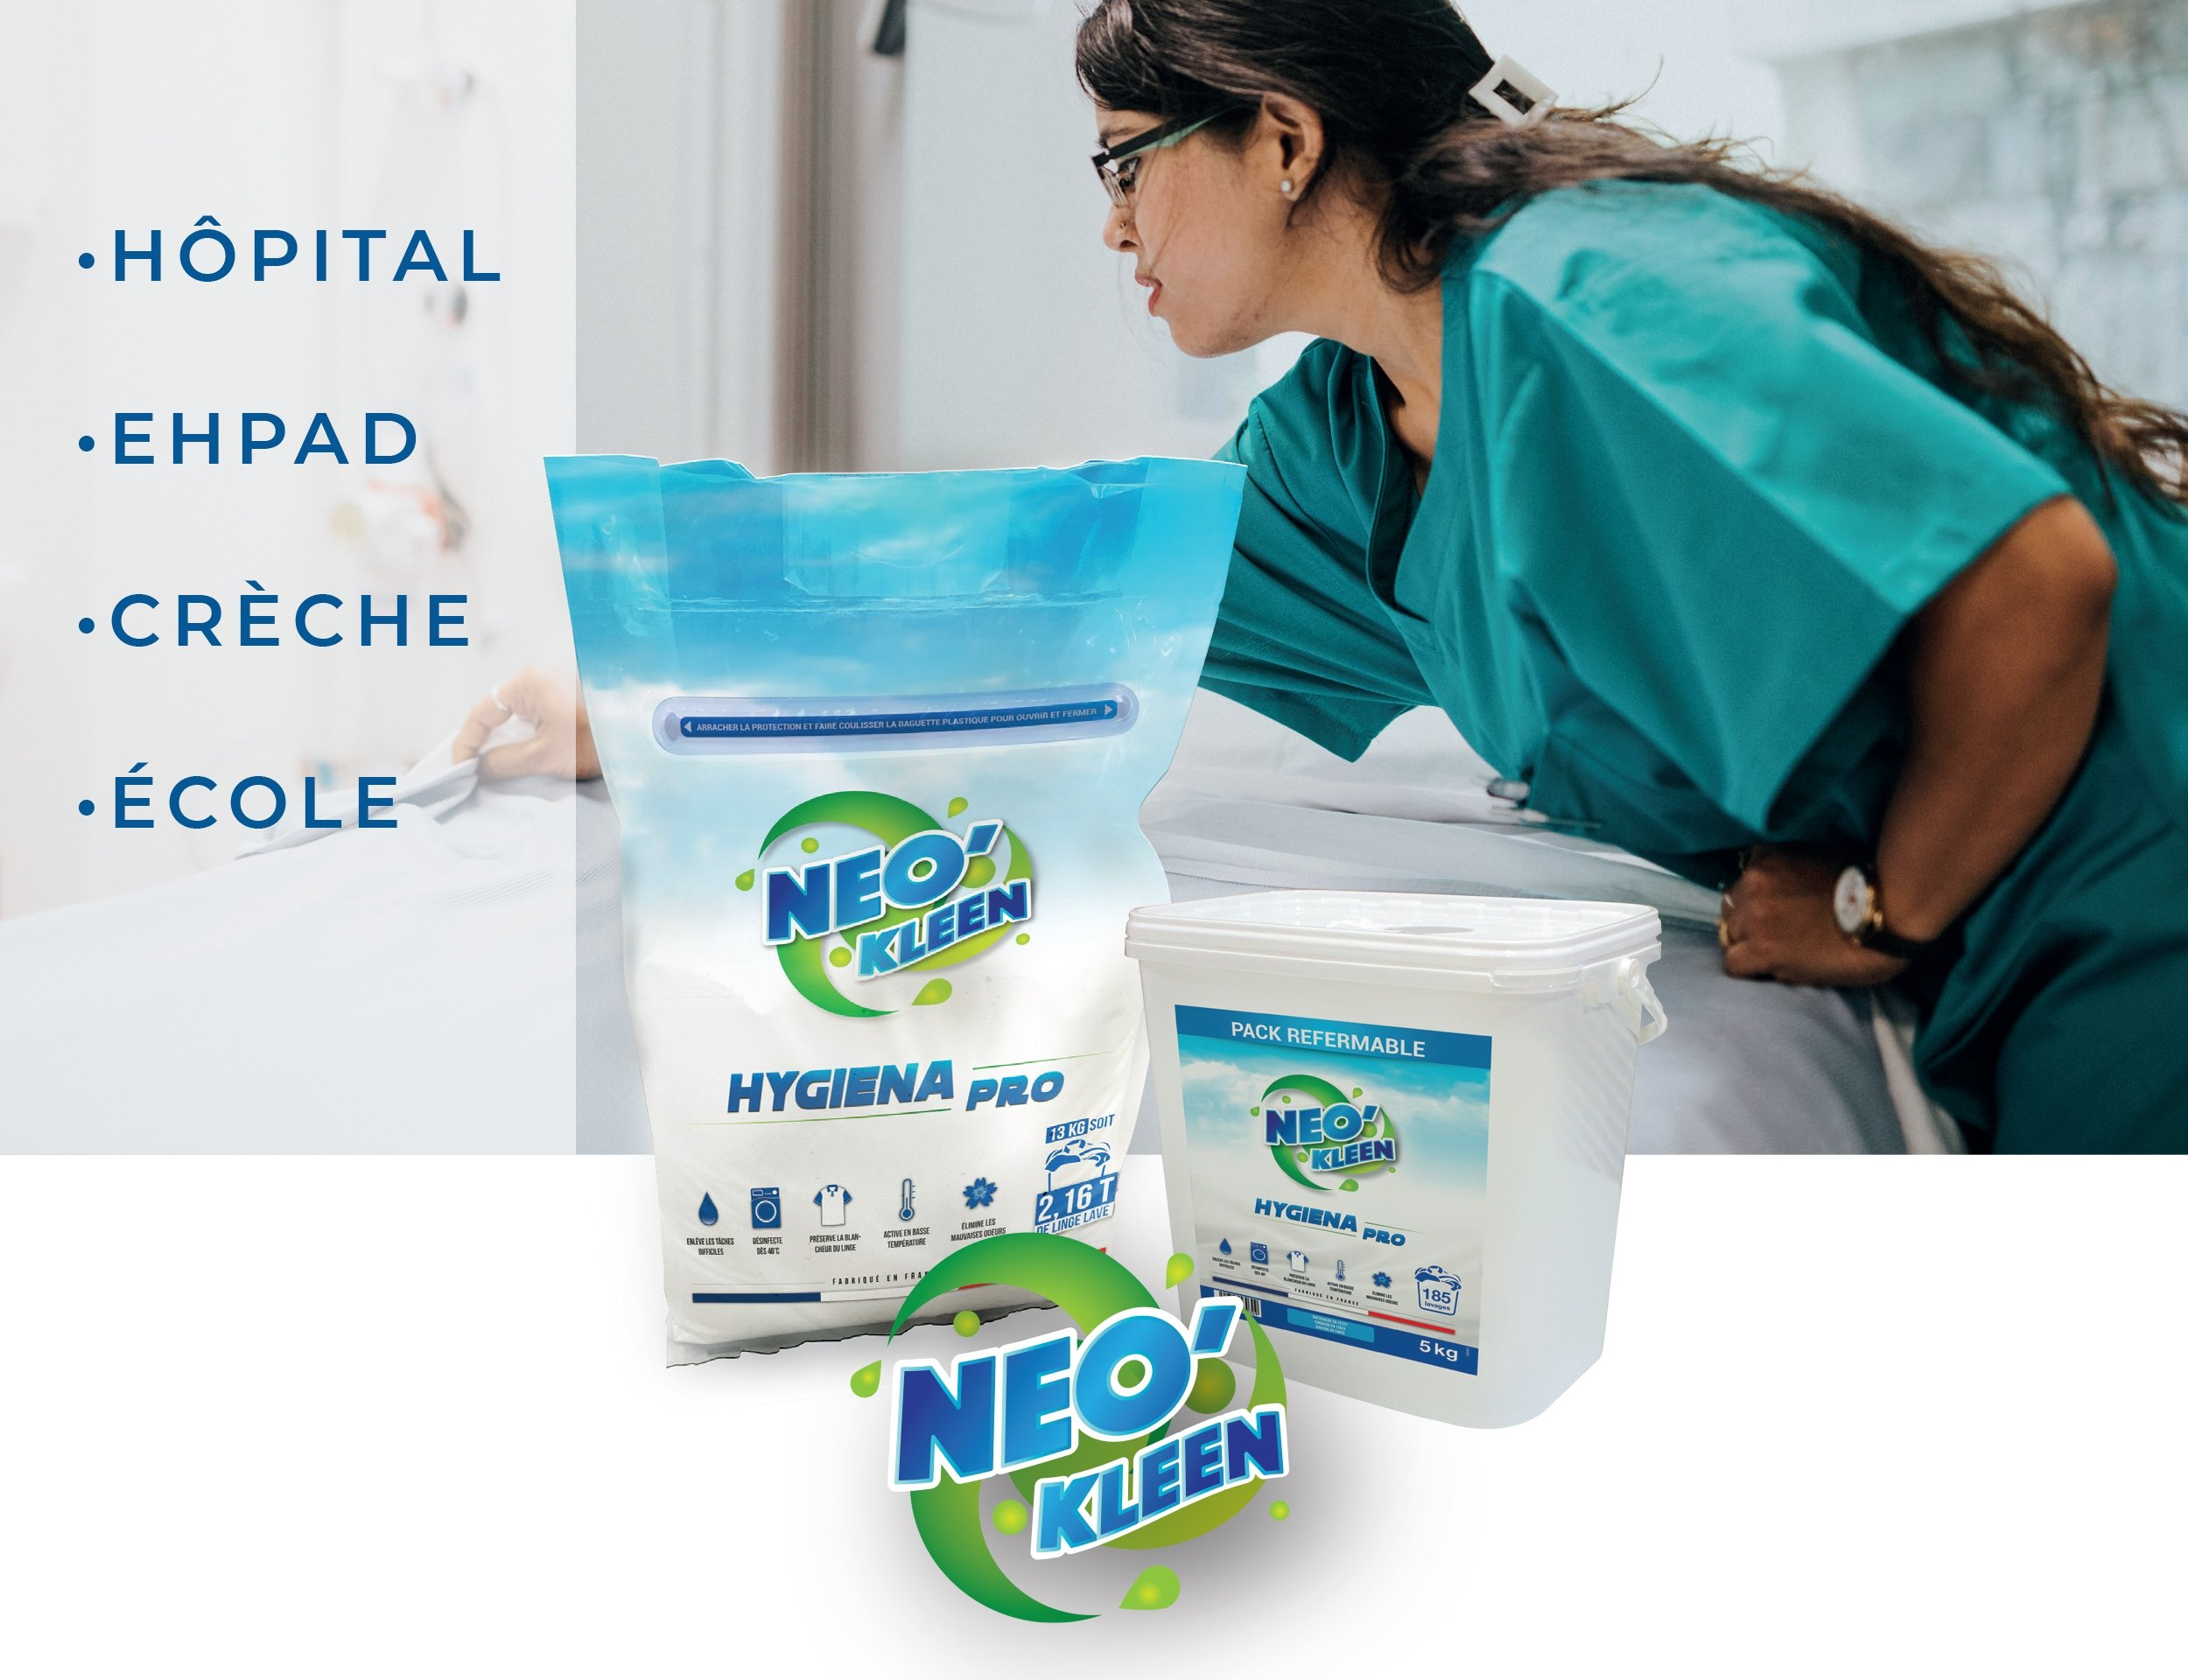 cpi-hygiene-lessive-virucide-sac-13-kg-nk-hygiena-pro